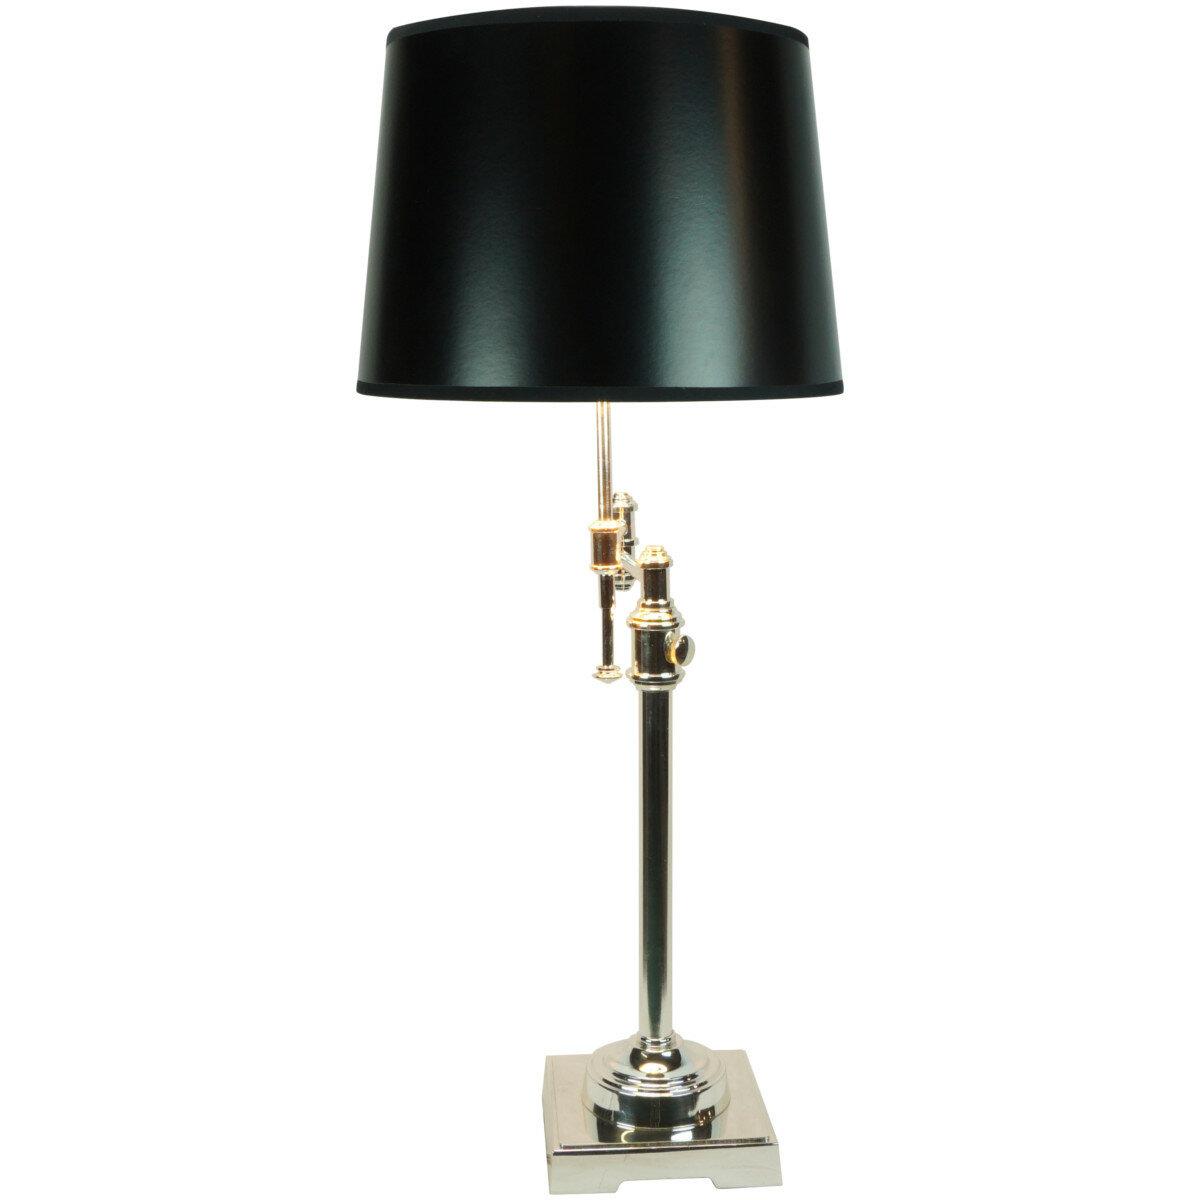 Laura Ashley Lighting State Street Shiny 23 Table Lamp EBay